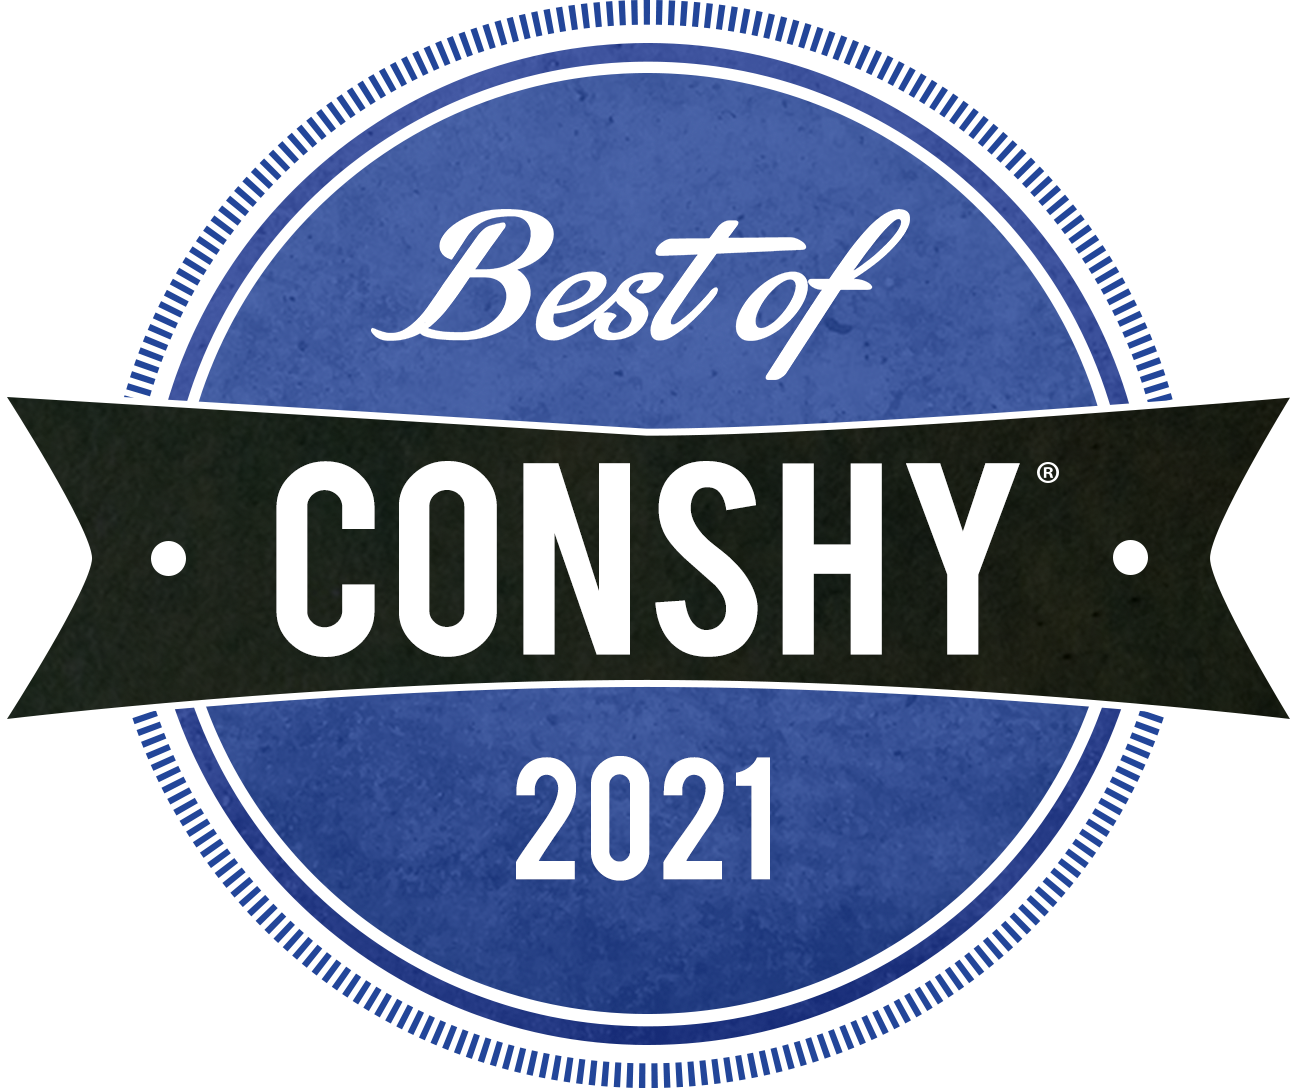 Best of Conshy 2021